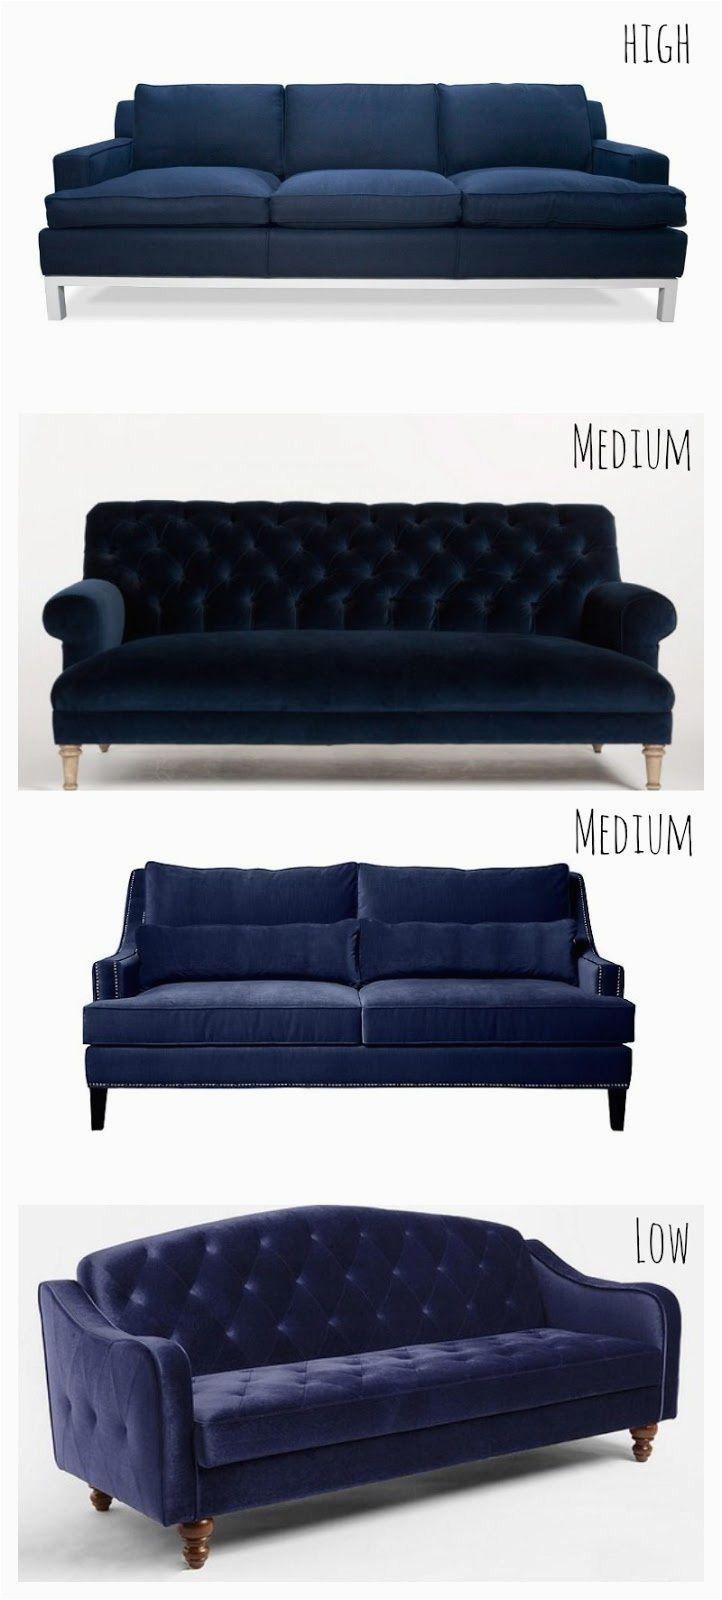 Navy Blue Futon Sofa Bed In 2020 Furniture Sofa Blue Sofa